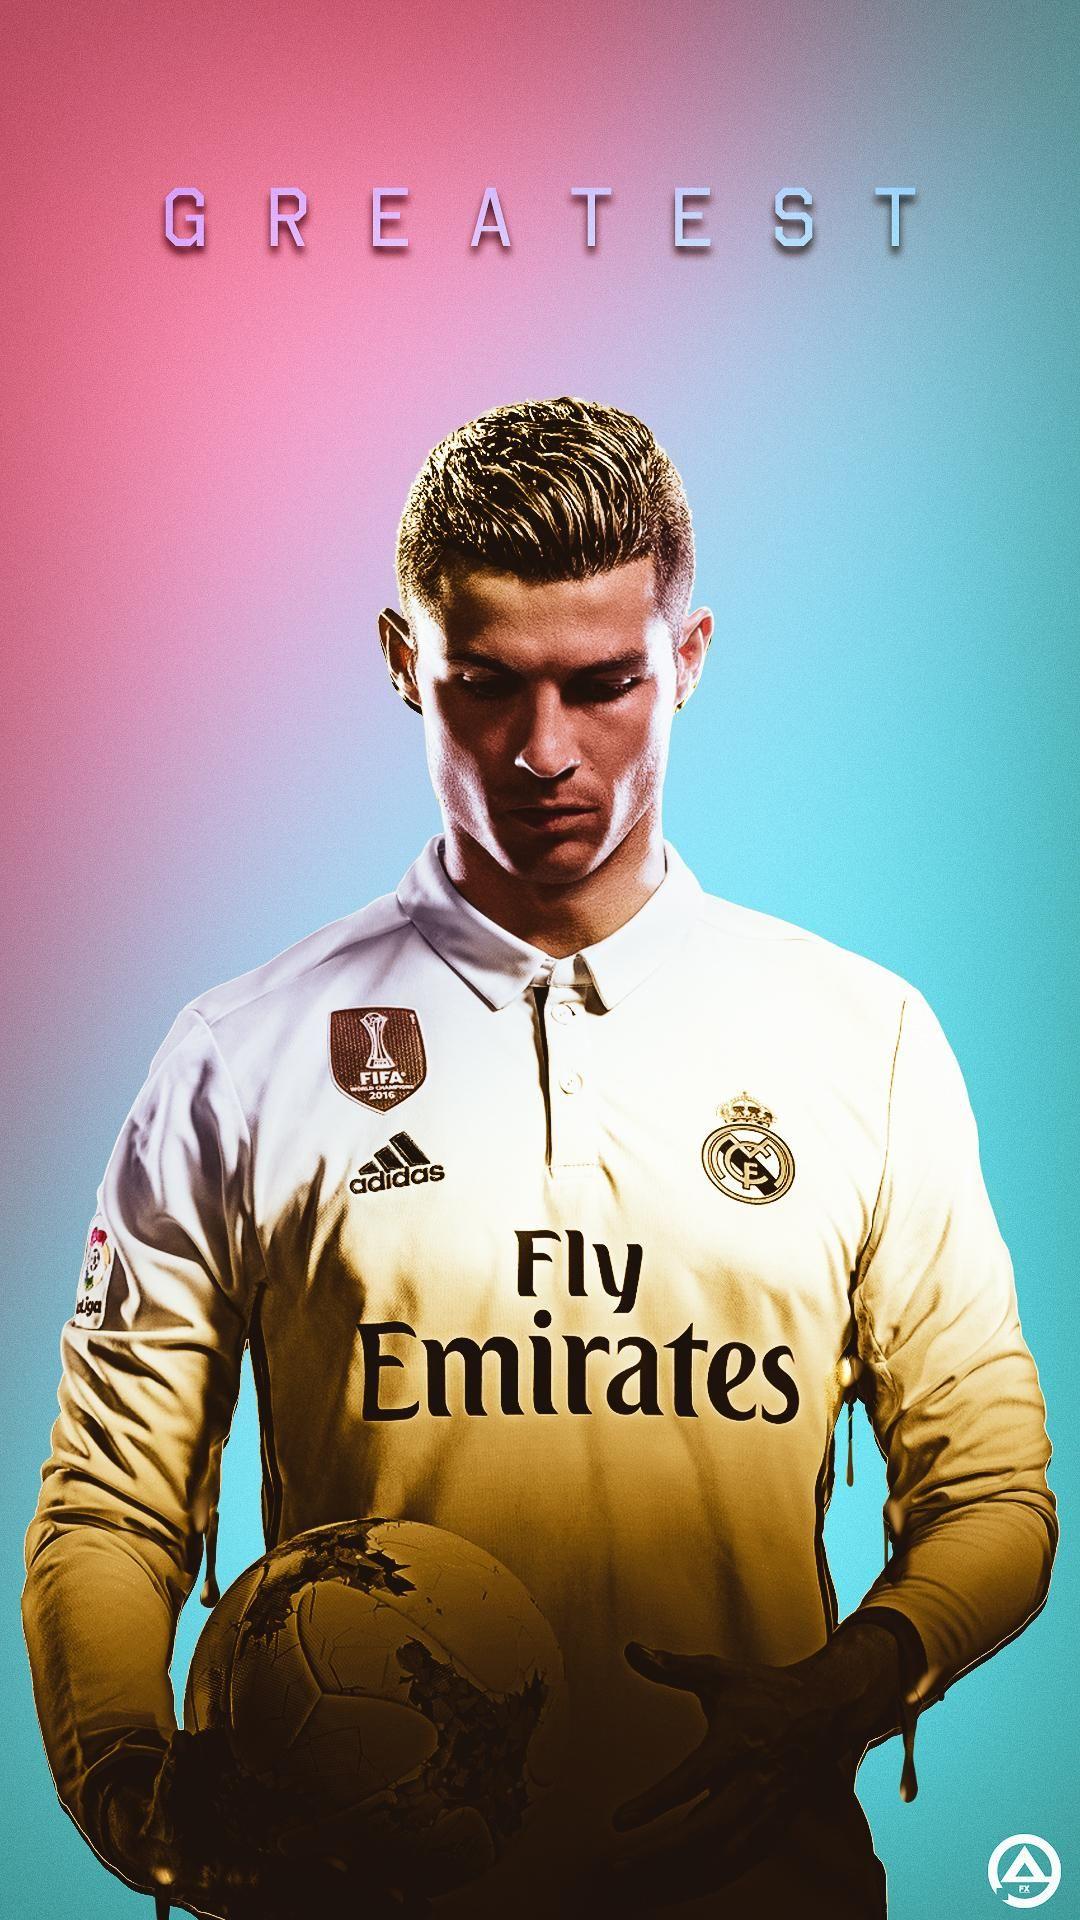 Lock Screen Real Madrid Wallpaper Iphone Hd Football In 2020 Cristiano Ronaldo Real Madrid Logo Wallpapers Real Madrid Wallpapers